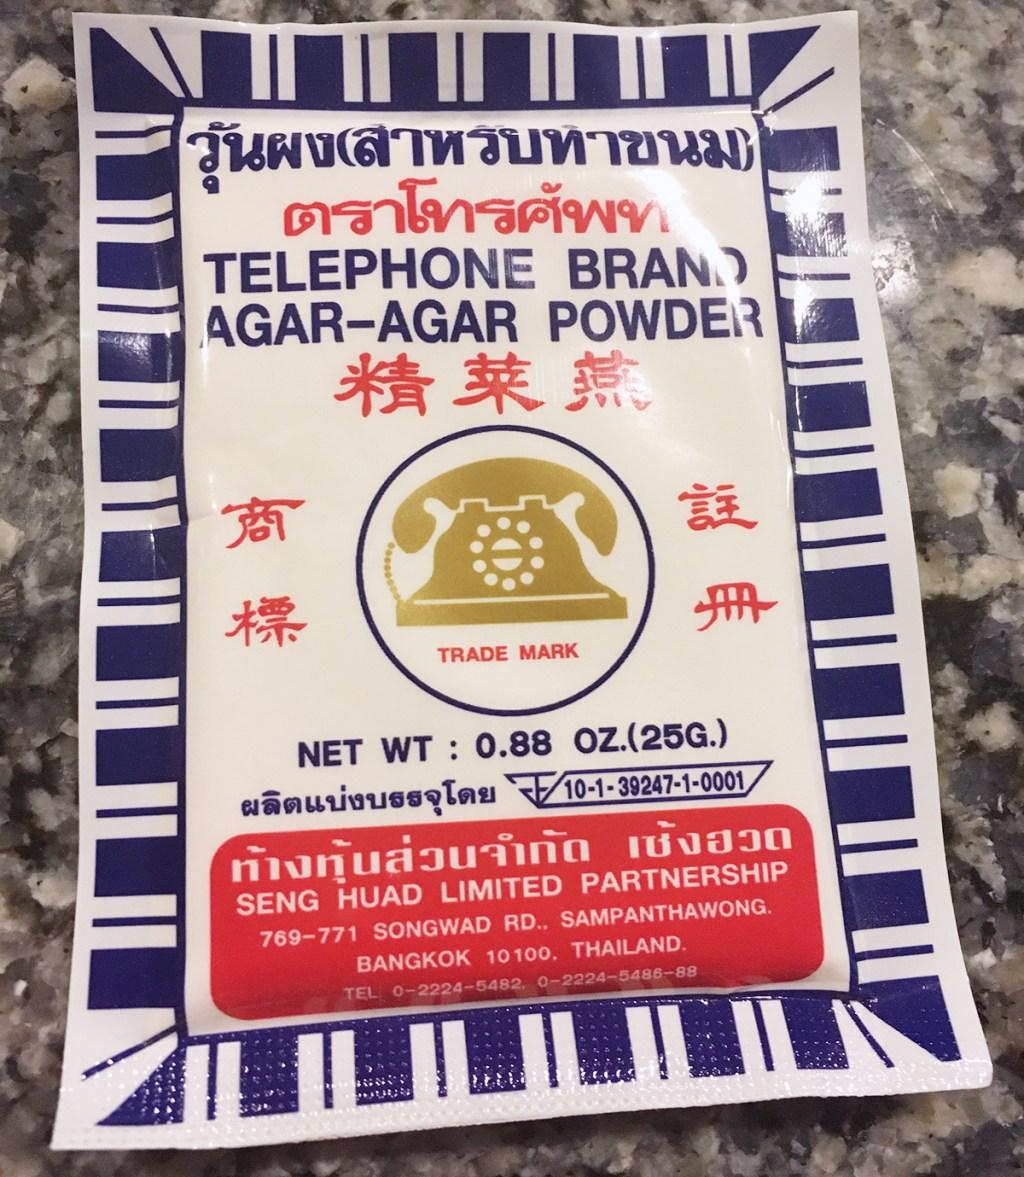 agar-agar powder from asian market